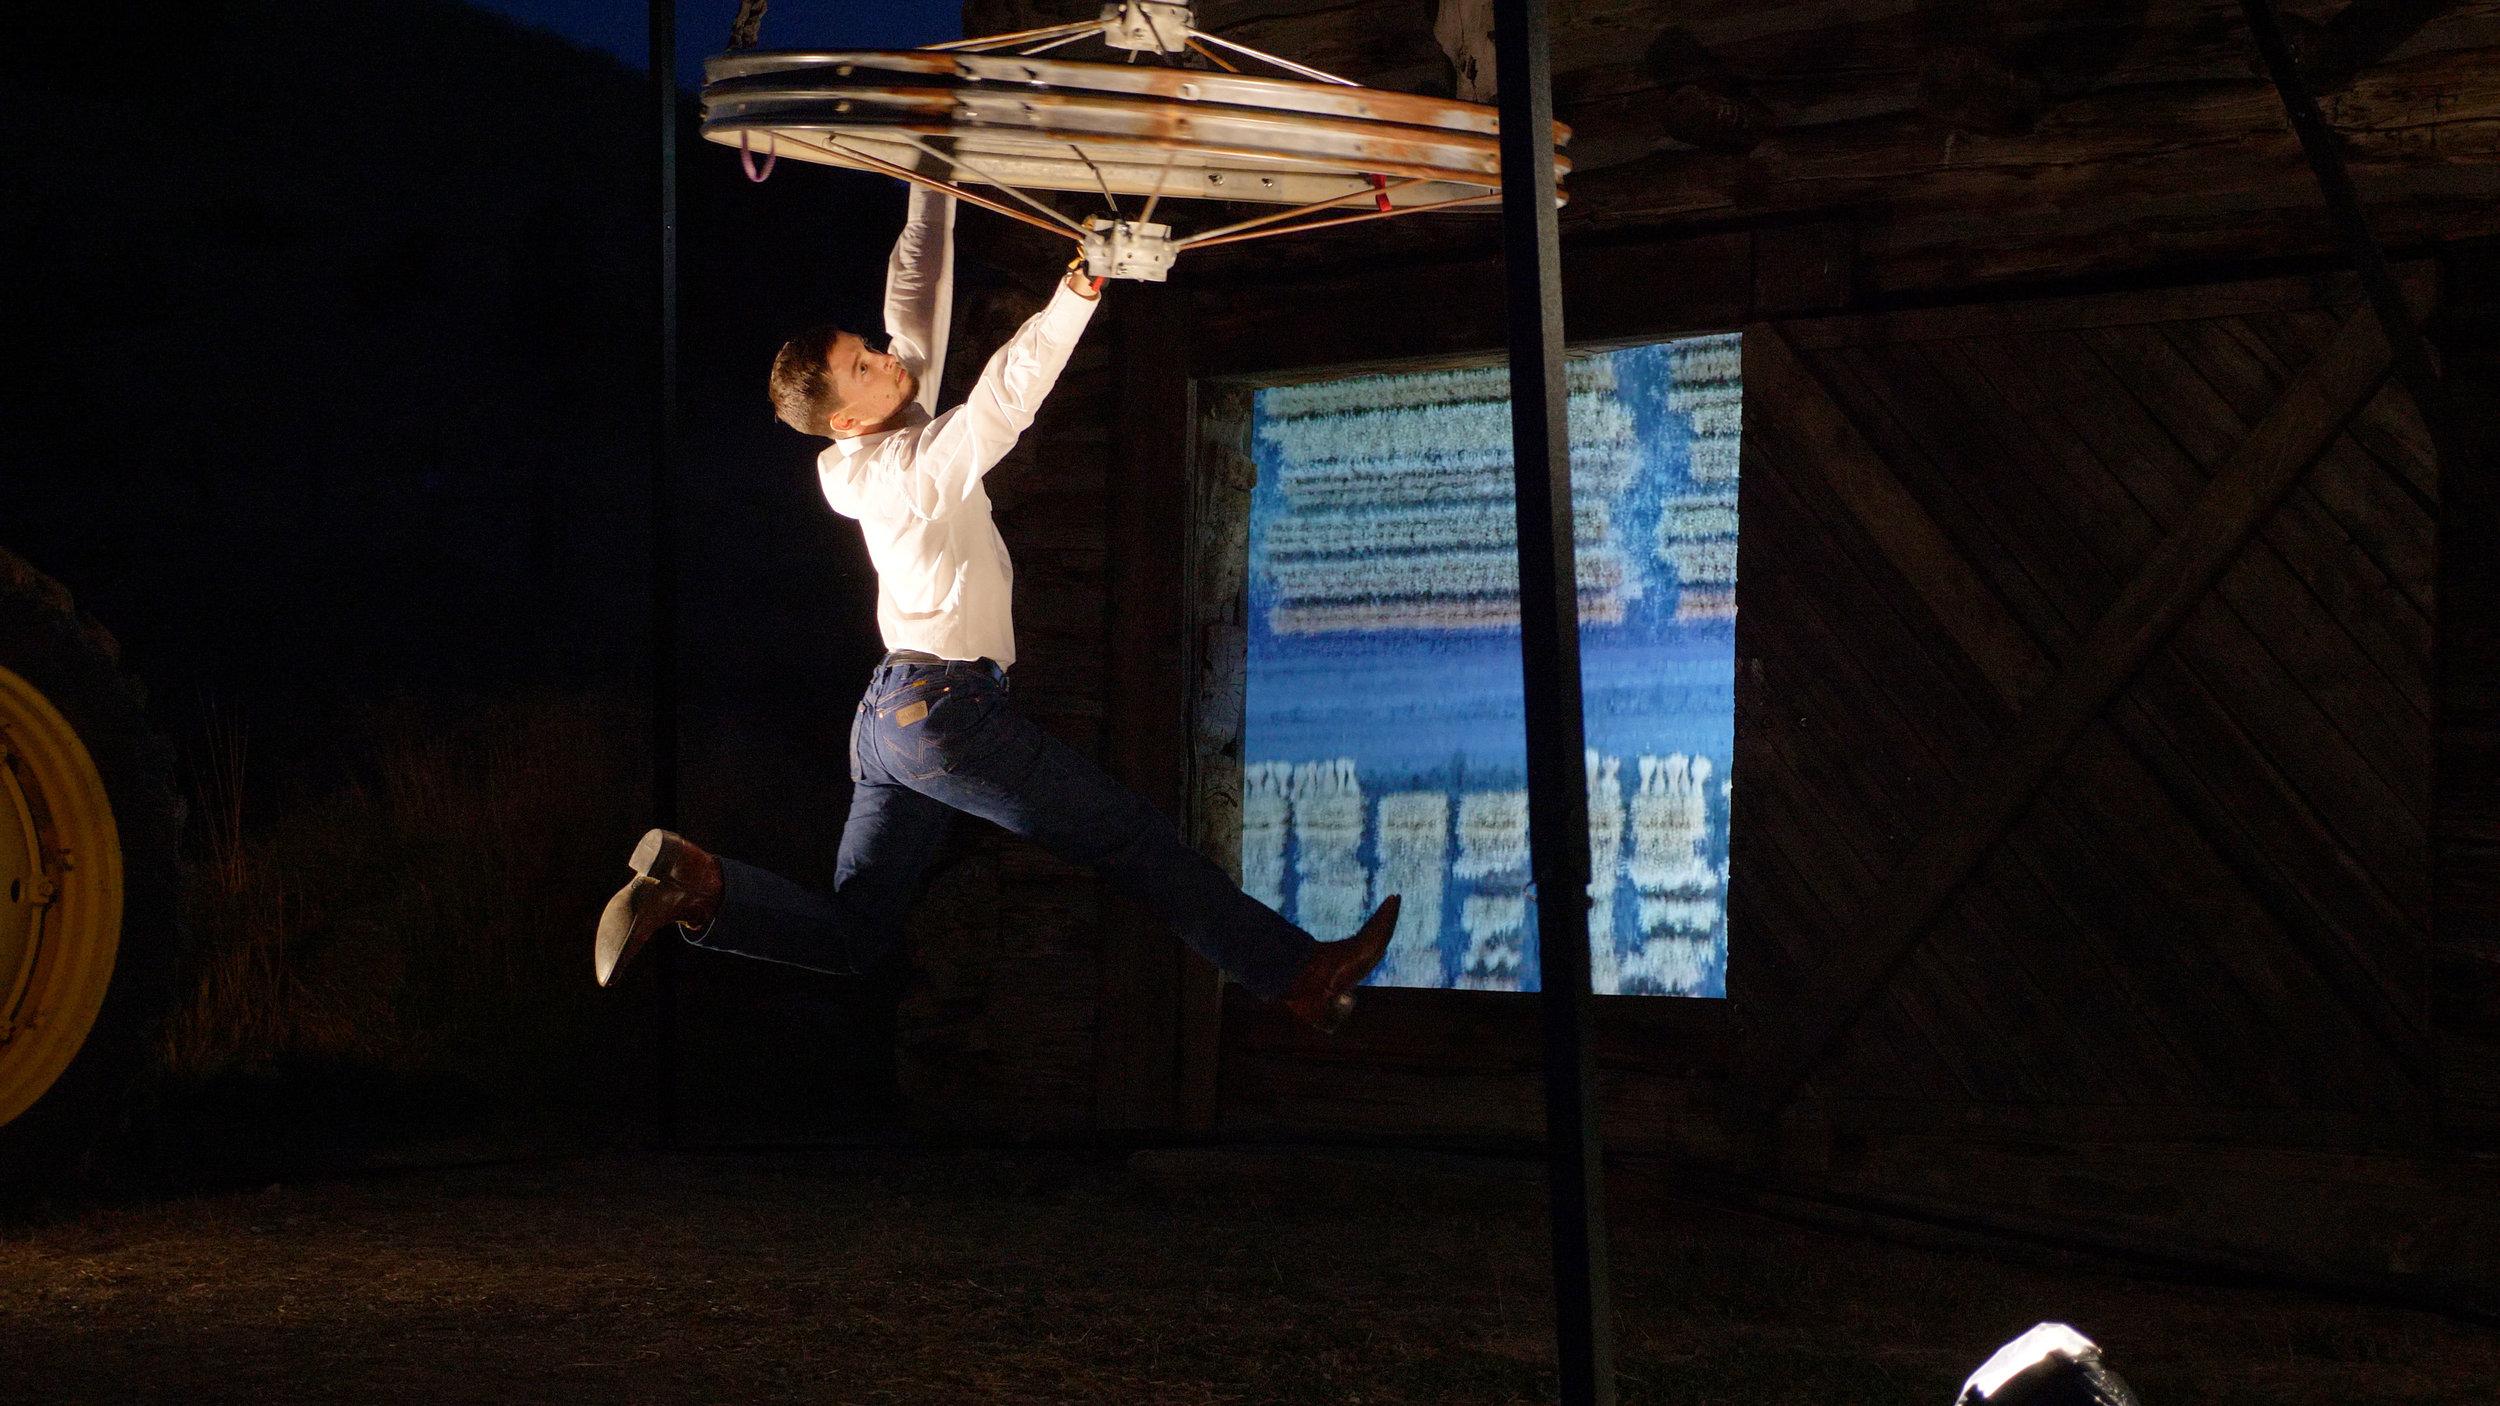 Michael O'Reilly, performer